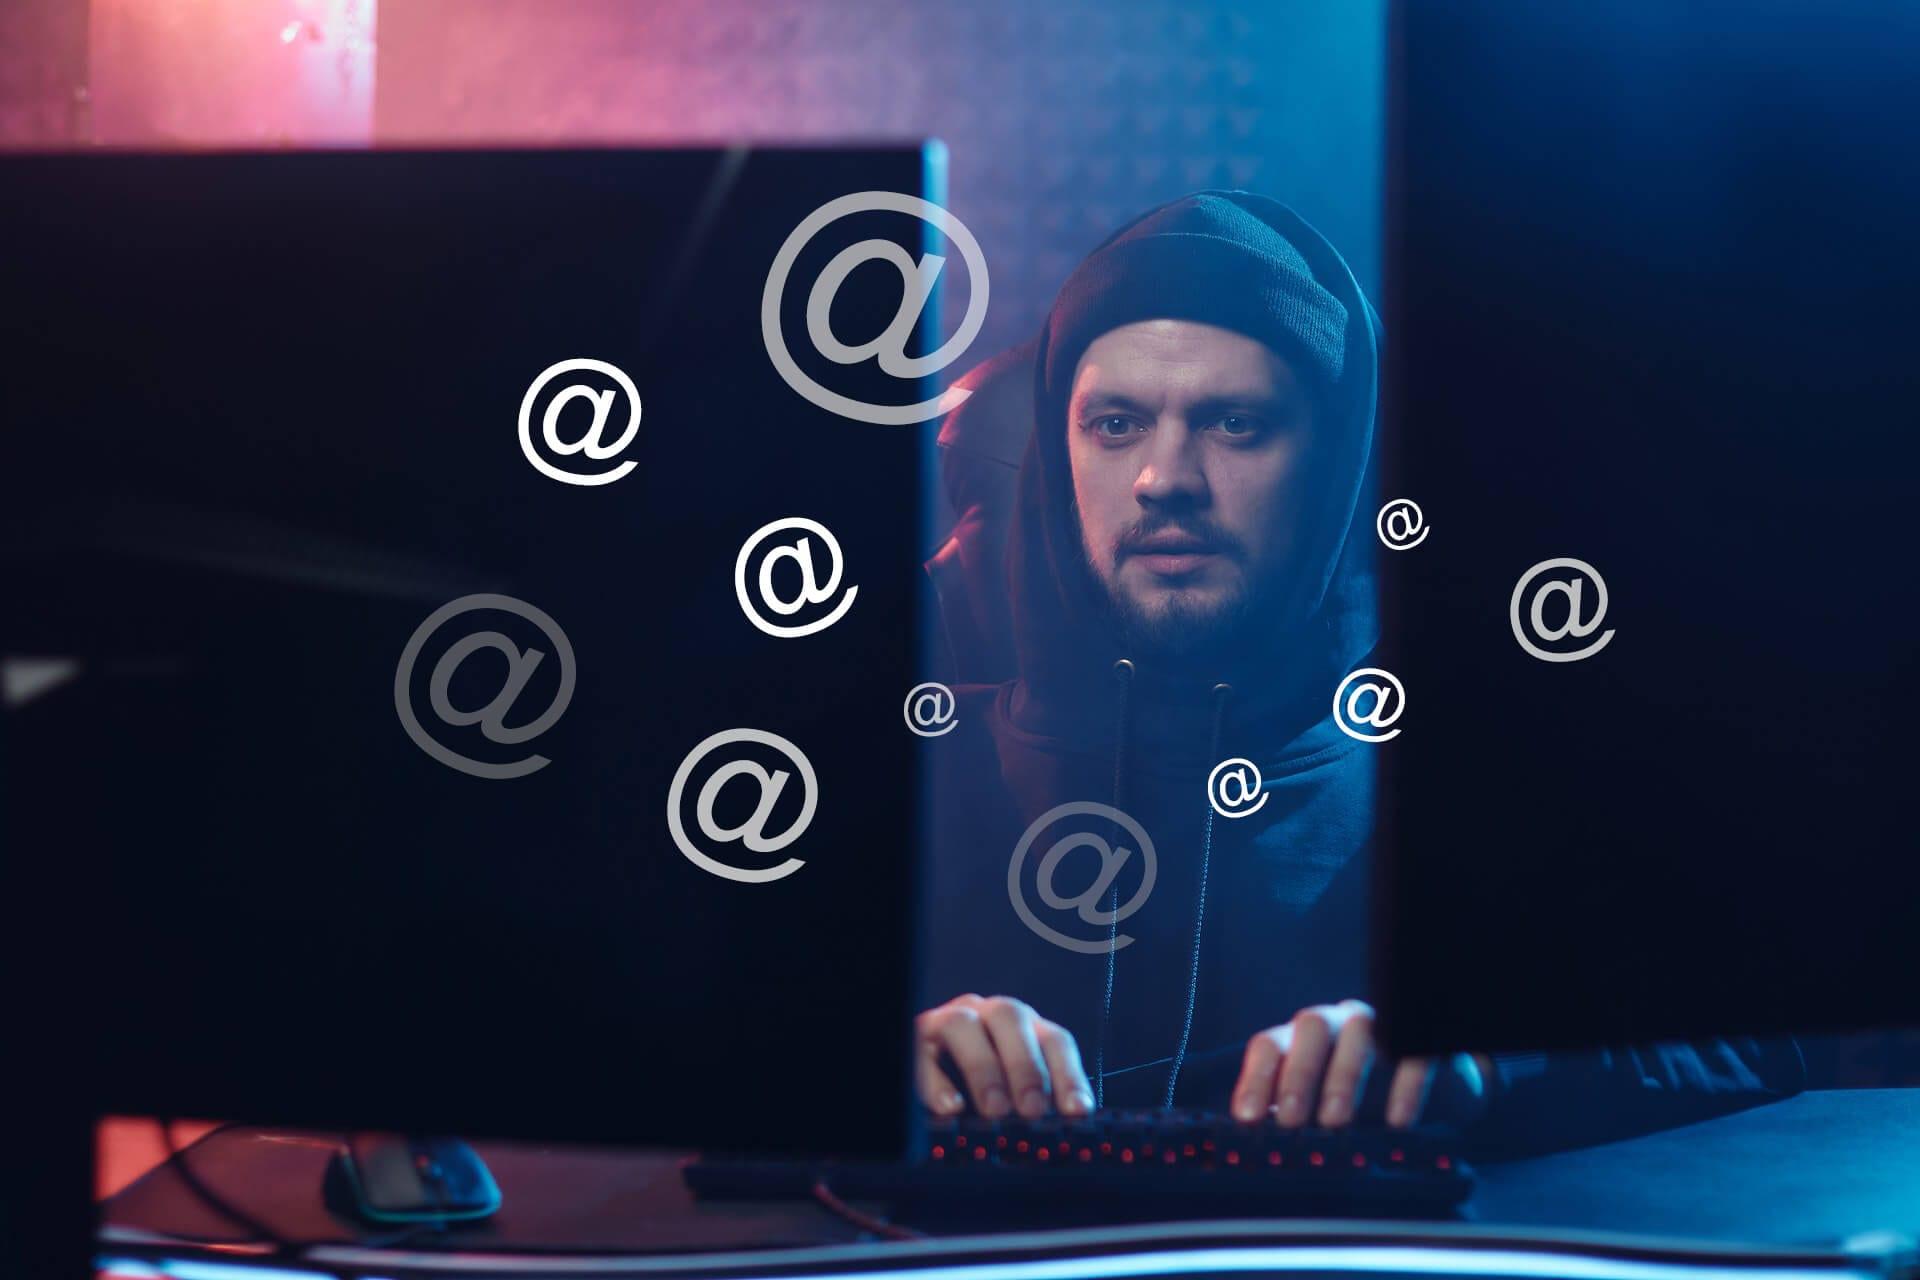 E-mail harvesting